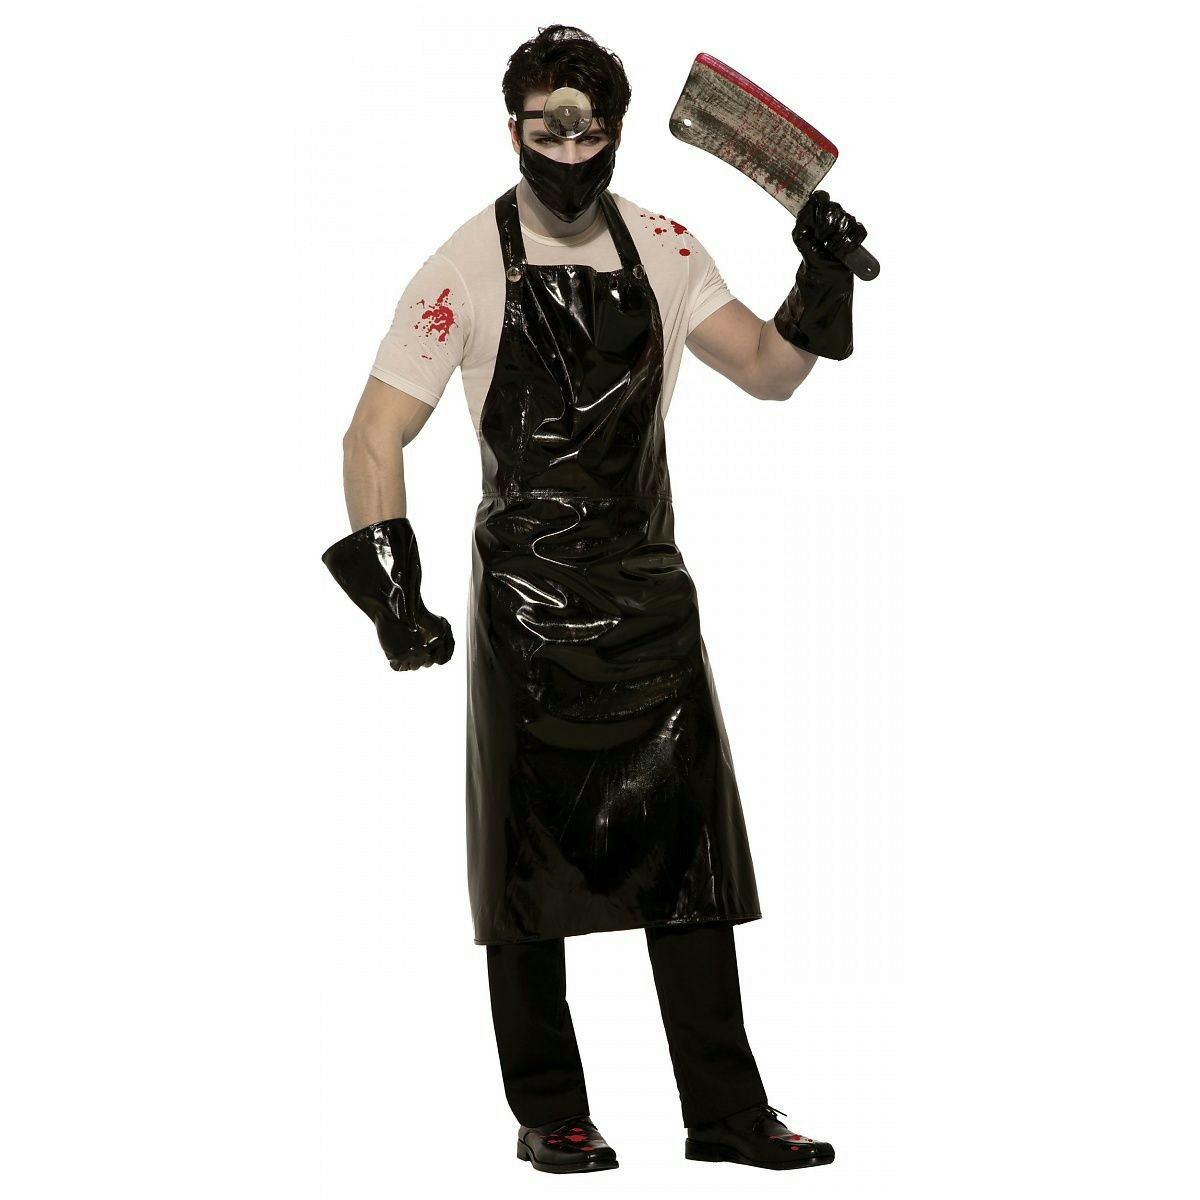 Details about Psycho Surgeon Adult Costume Evil Serial Killer